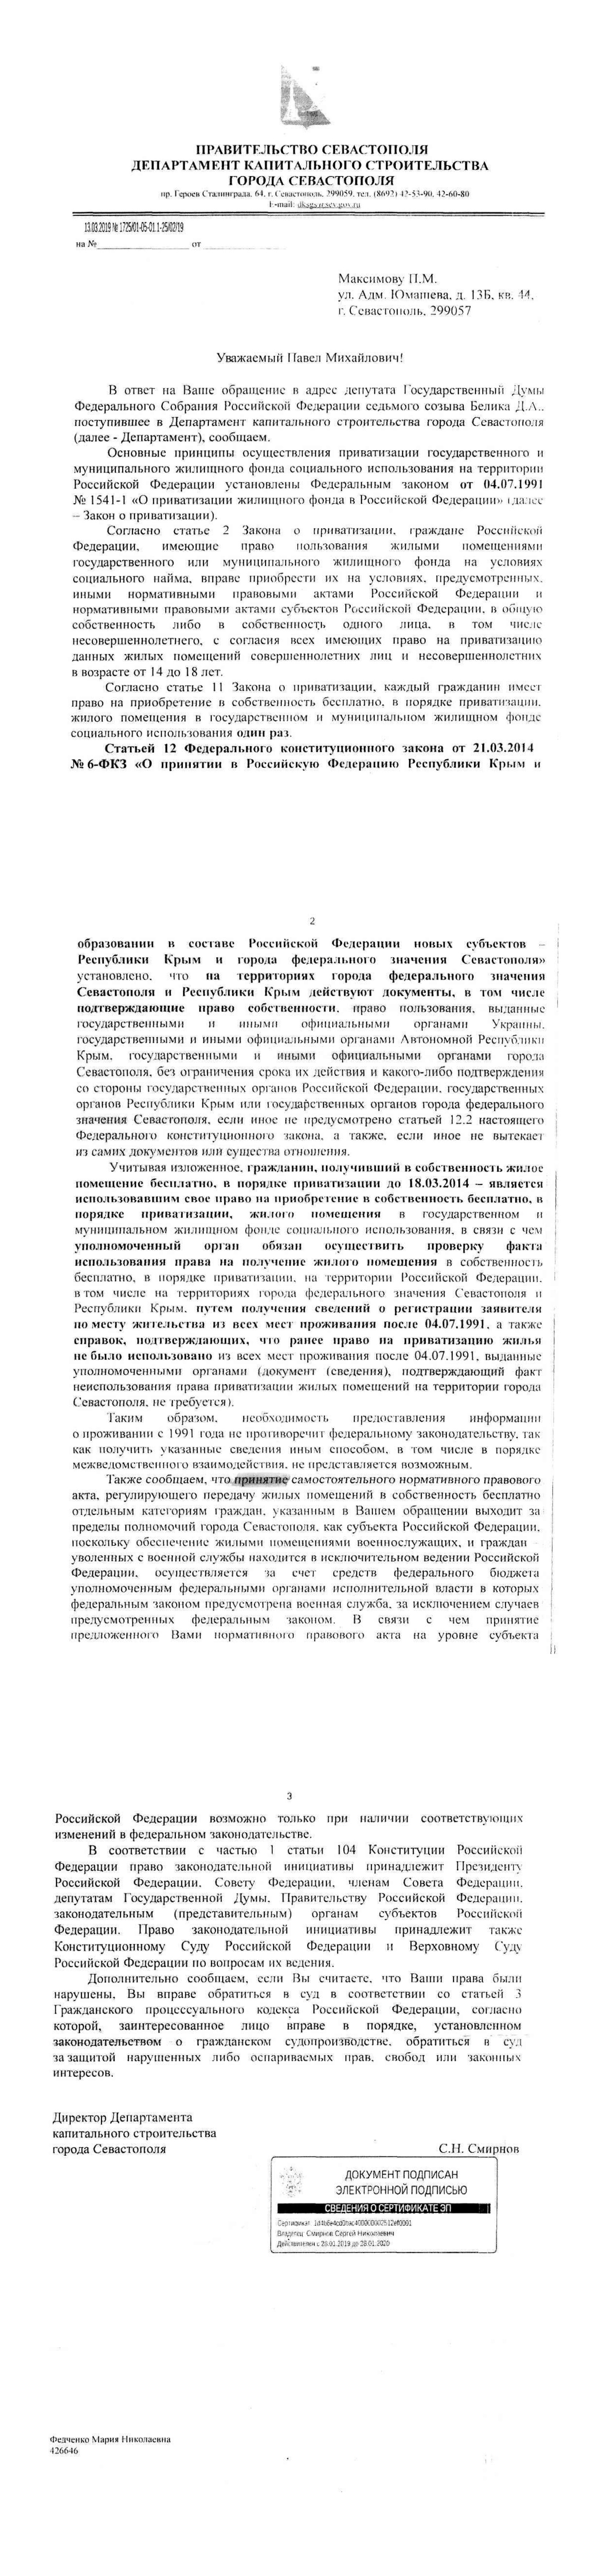 imgonline-com-ua-2to1-qRpfFQc5qGO3GnI.jpg